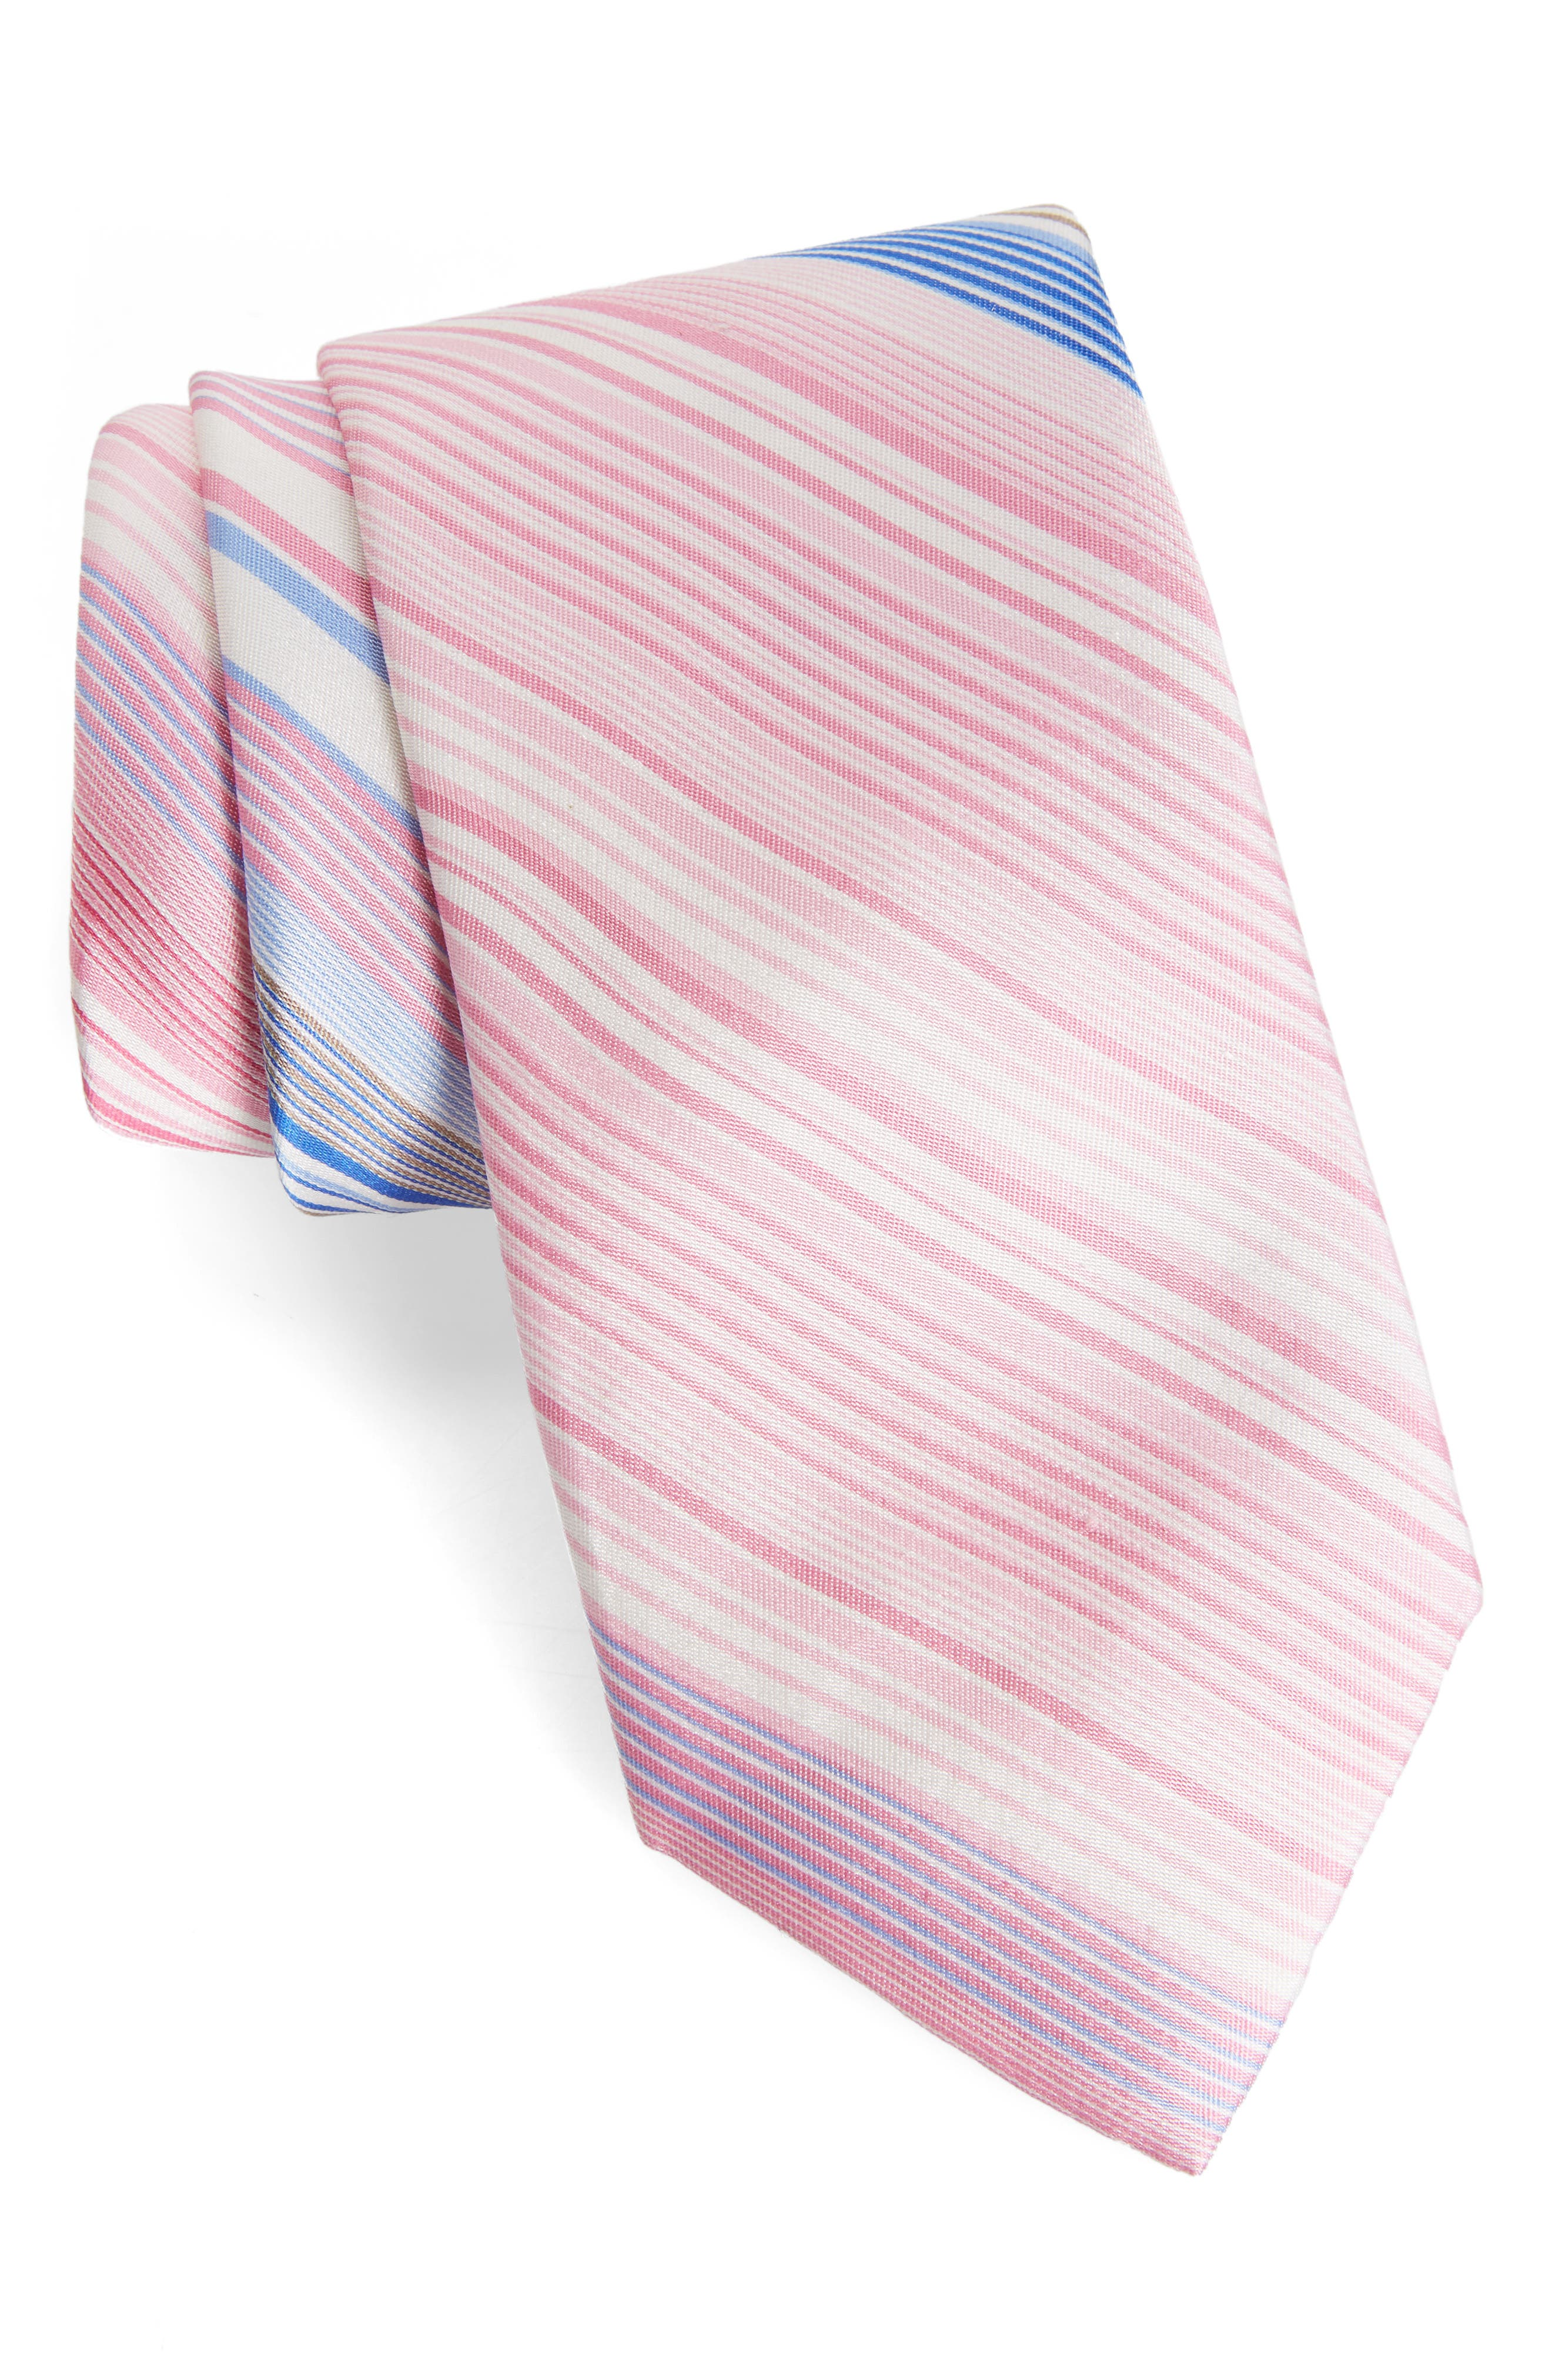 Magnolia Silk Tie,                             Main thumbnail 1, color,                             Pink